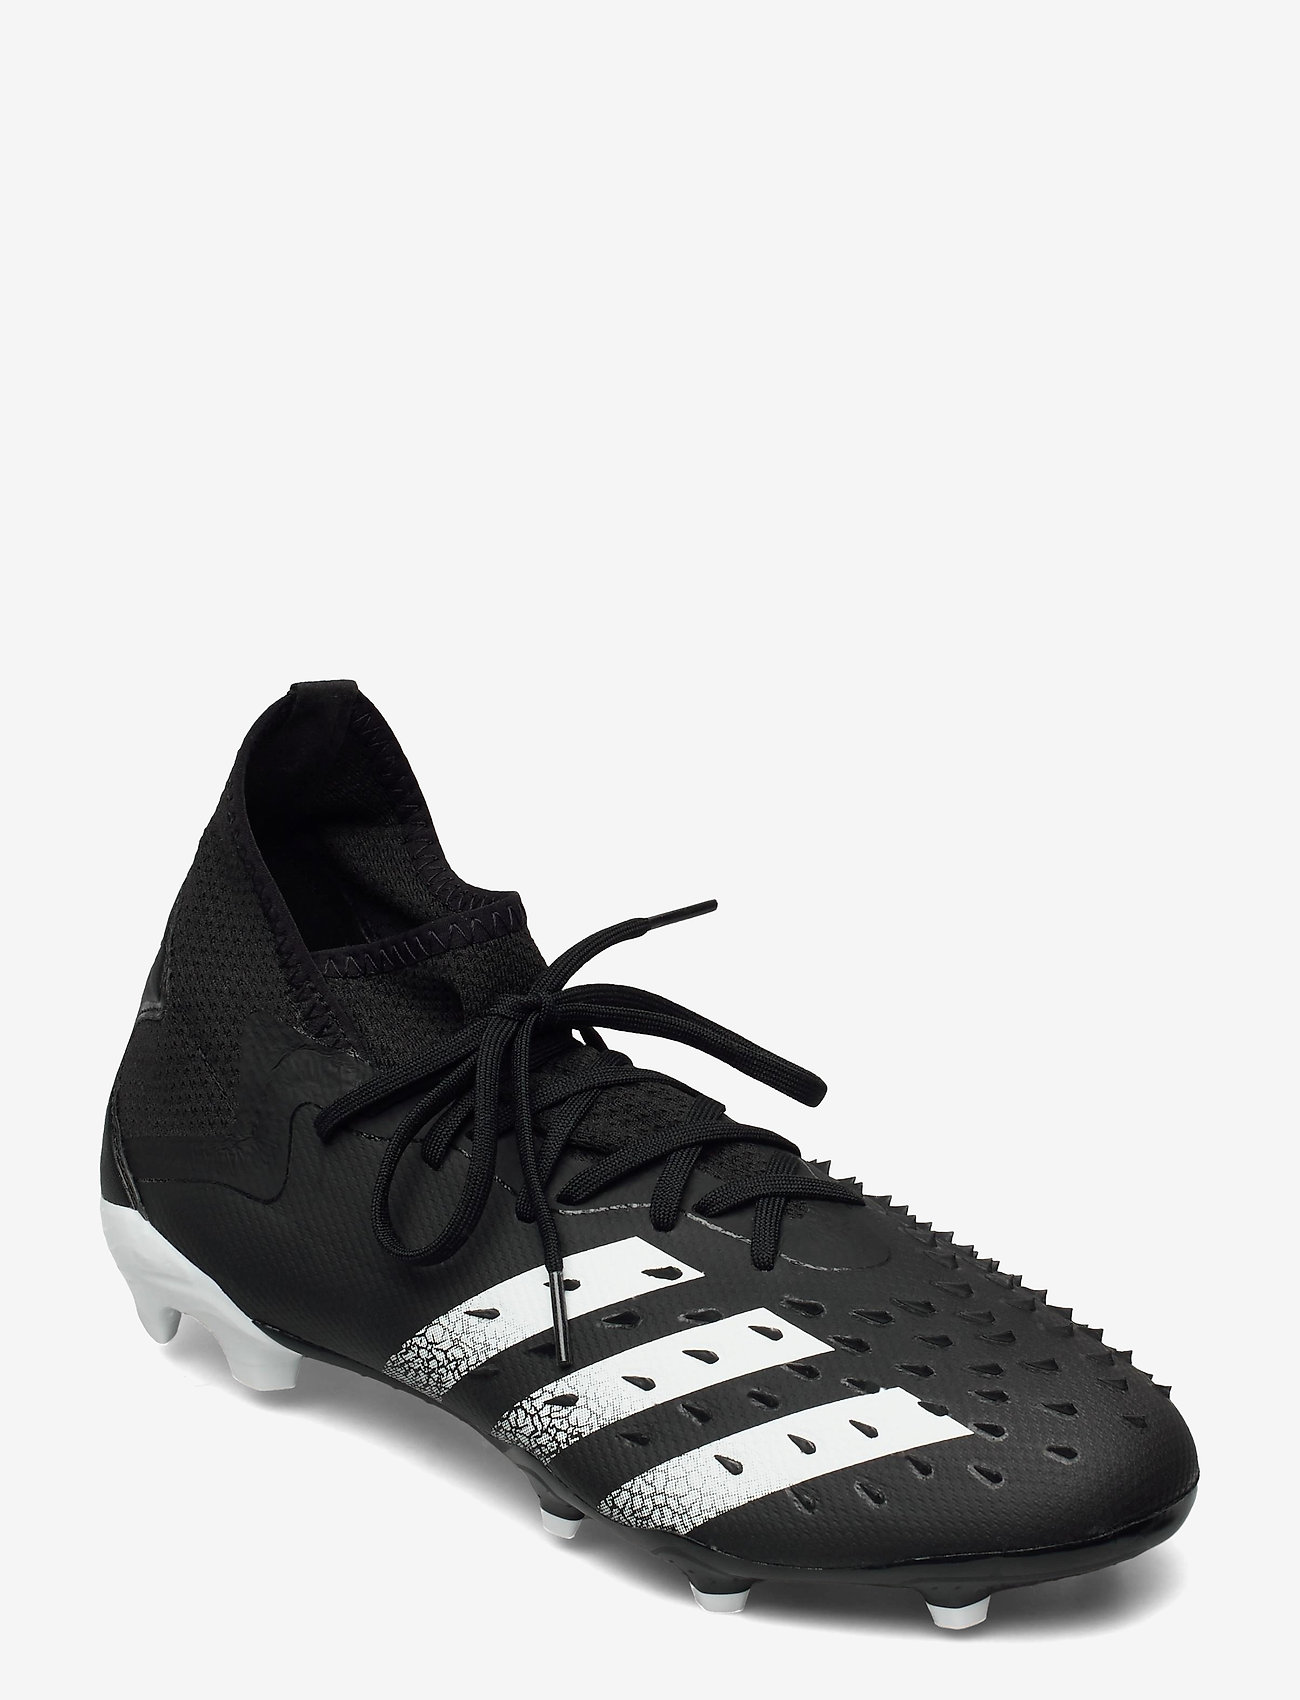 adidas Performance - PREDATOR FREAK .2 FG - fodboldsko - cblack/ftwwht/cblack - 0